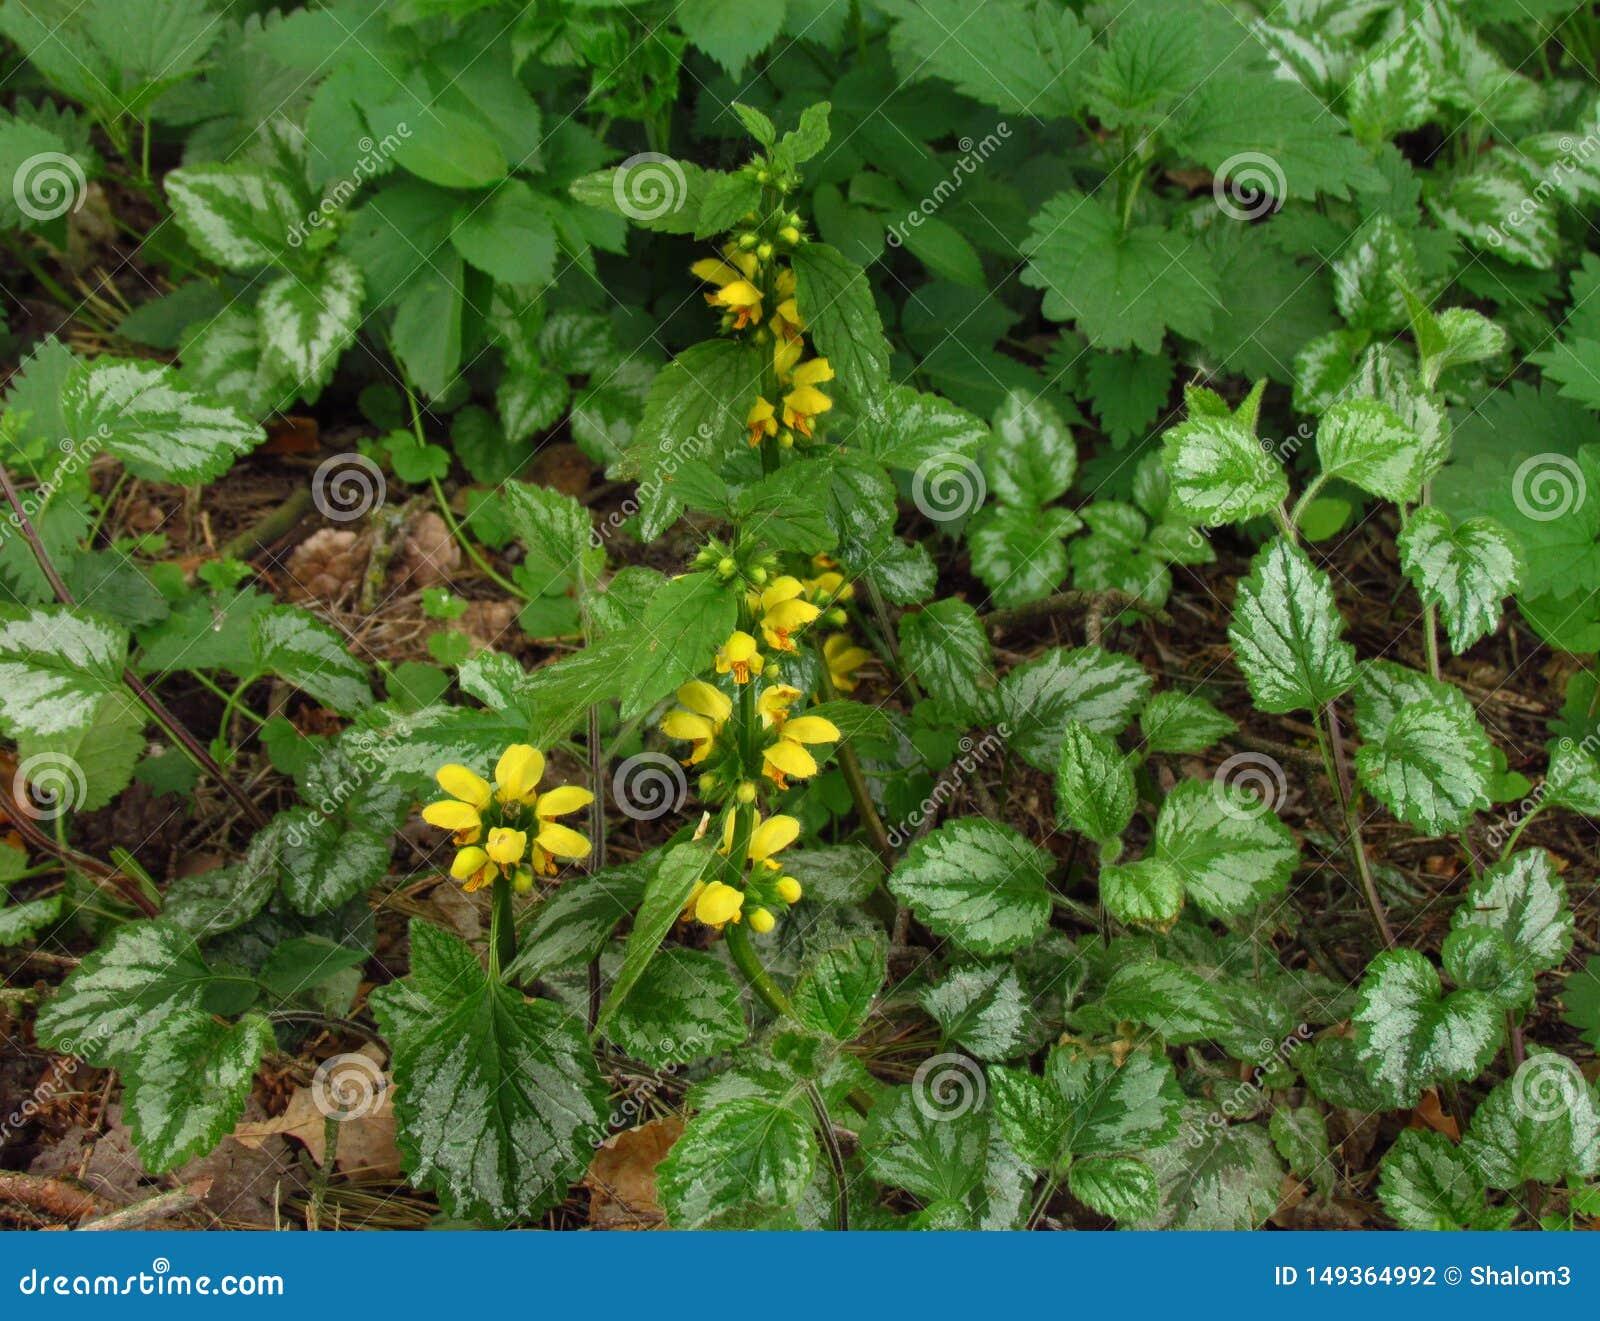 Lamiastrum galeobdolon其他名字Galeobdolon luteum,四季不断的黄色开花的草本